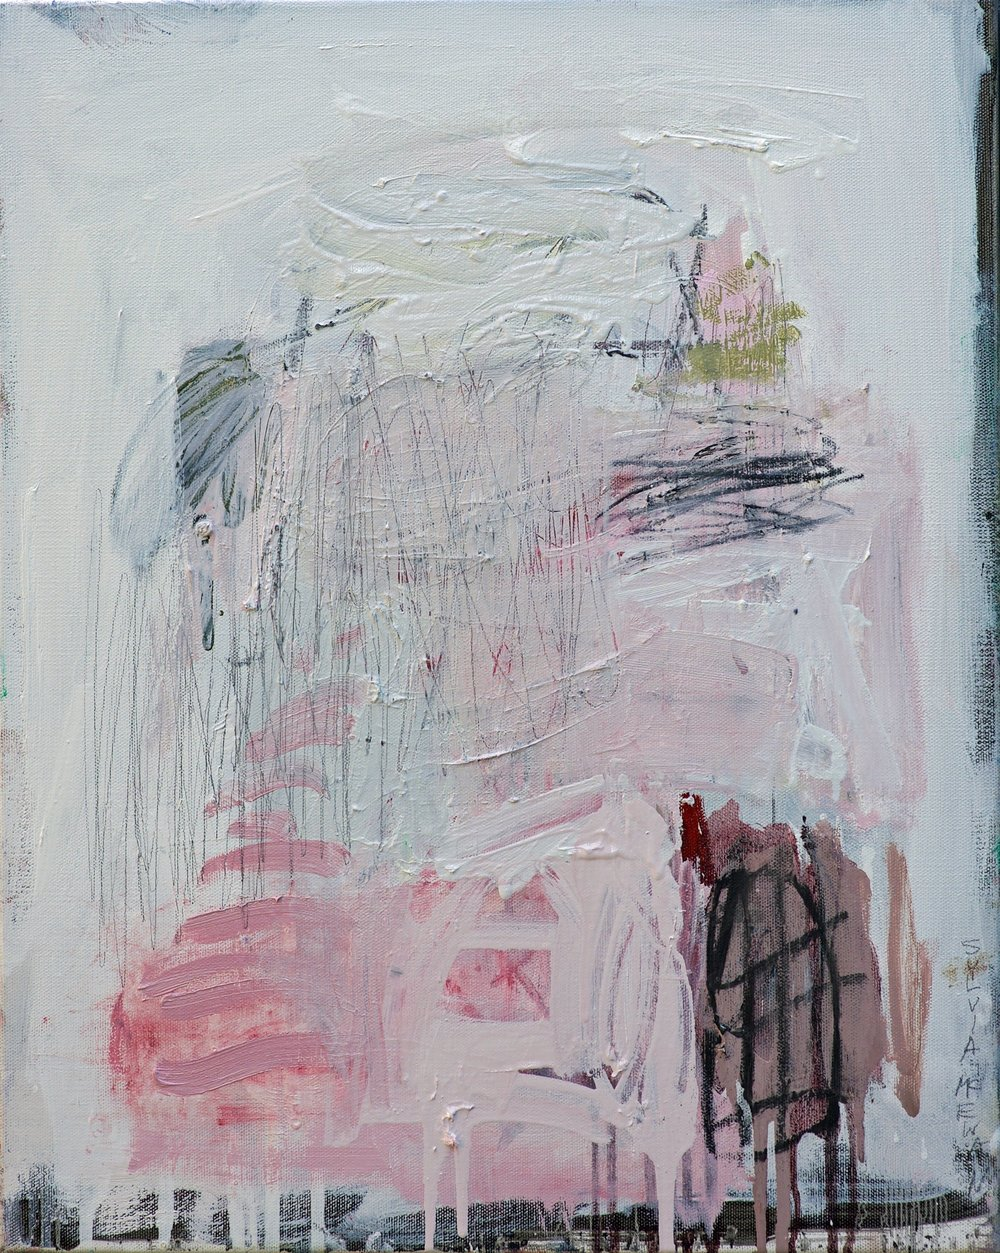 Untitled No. 37